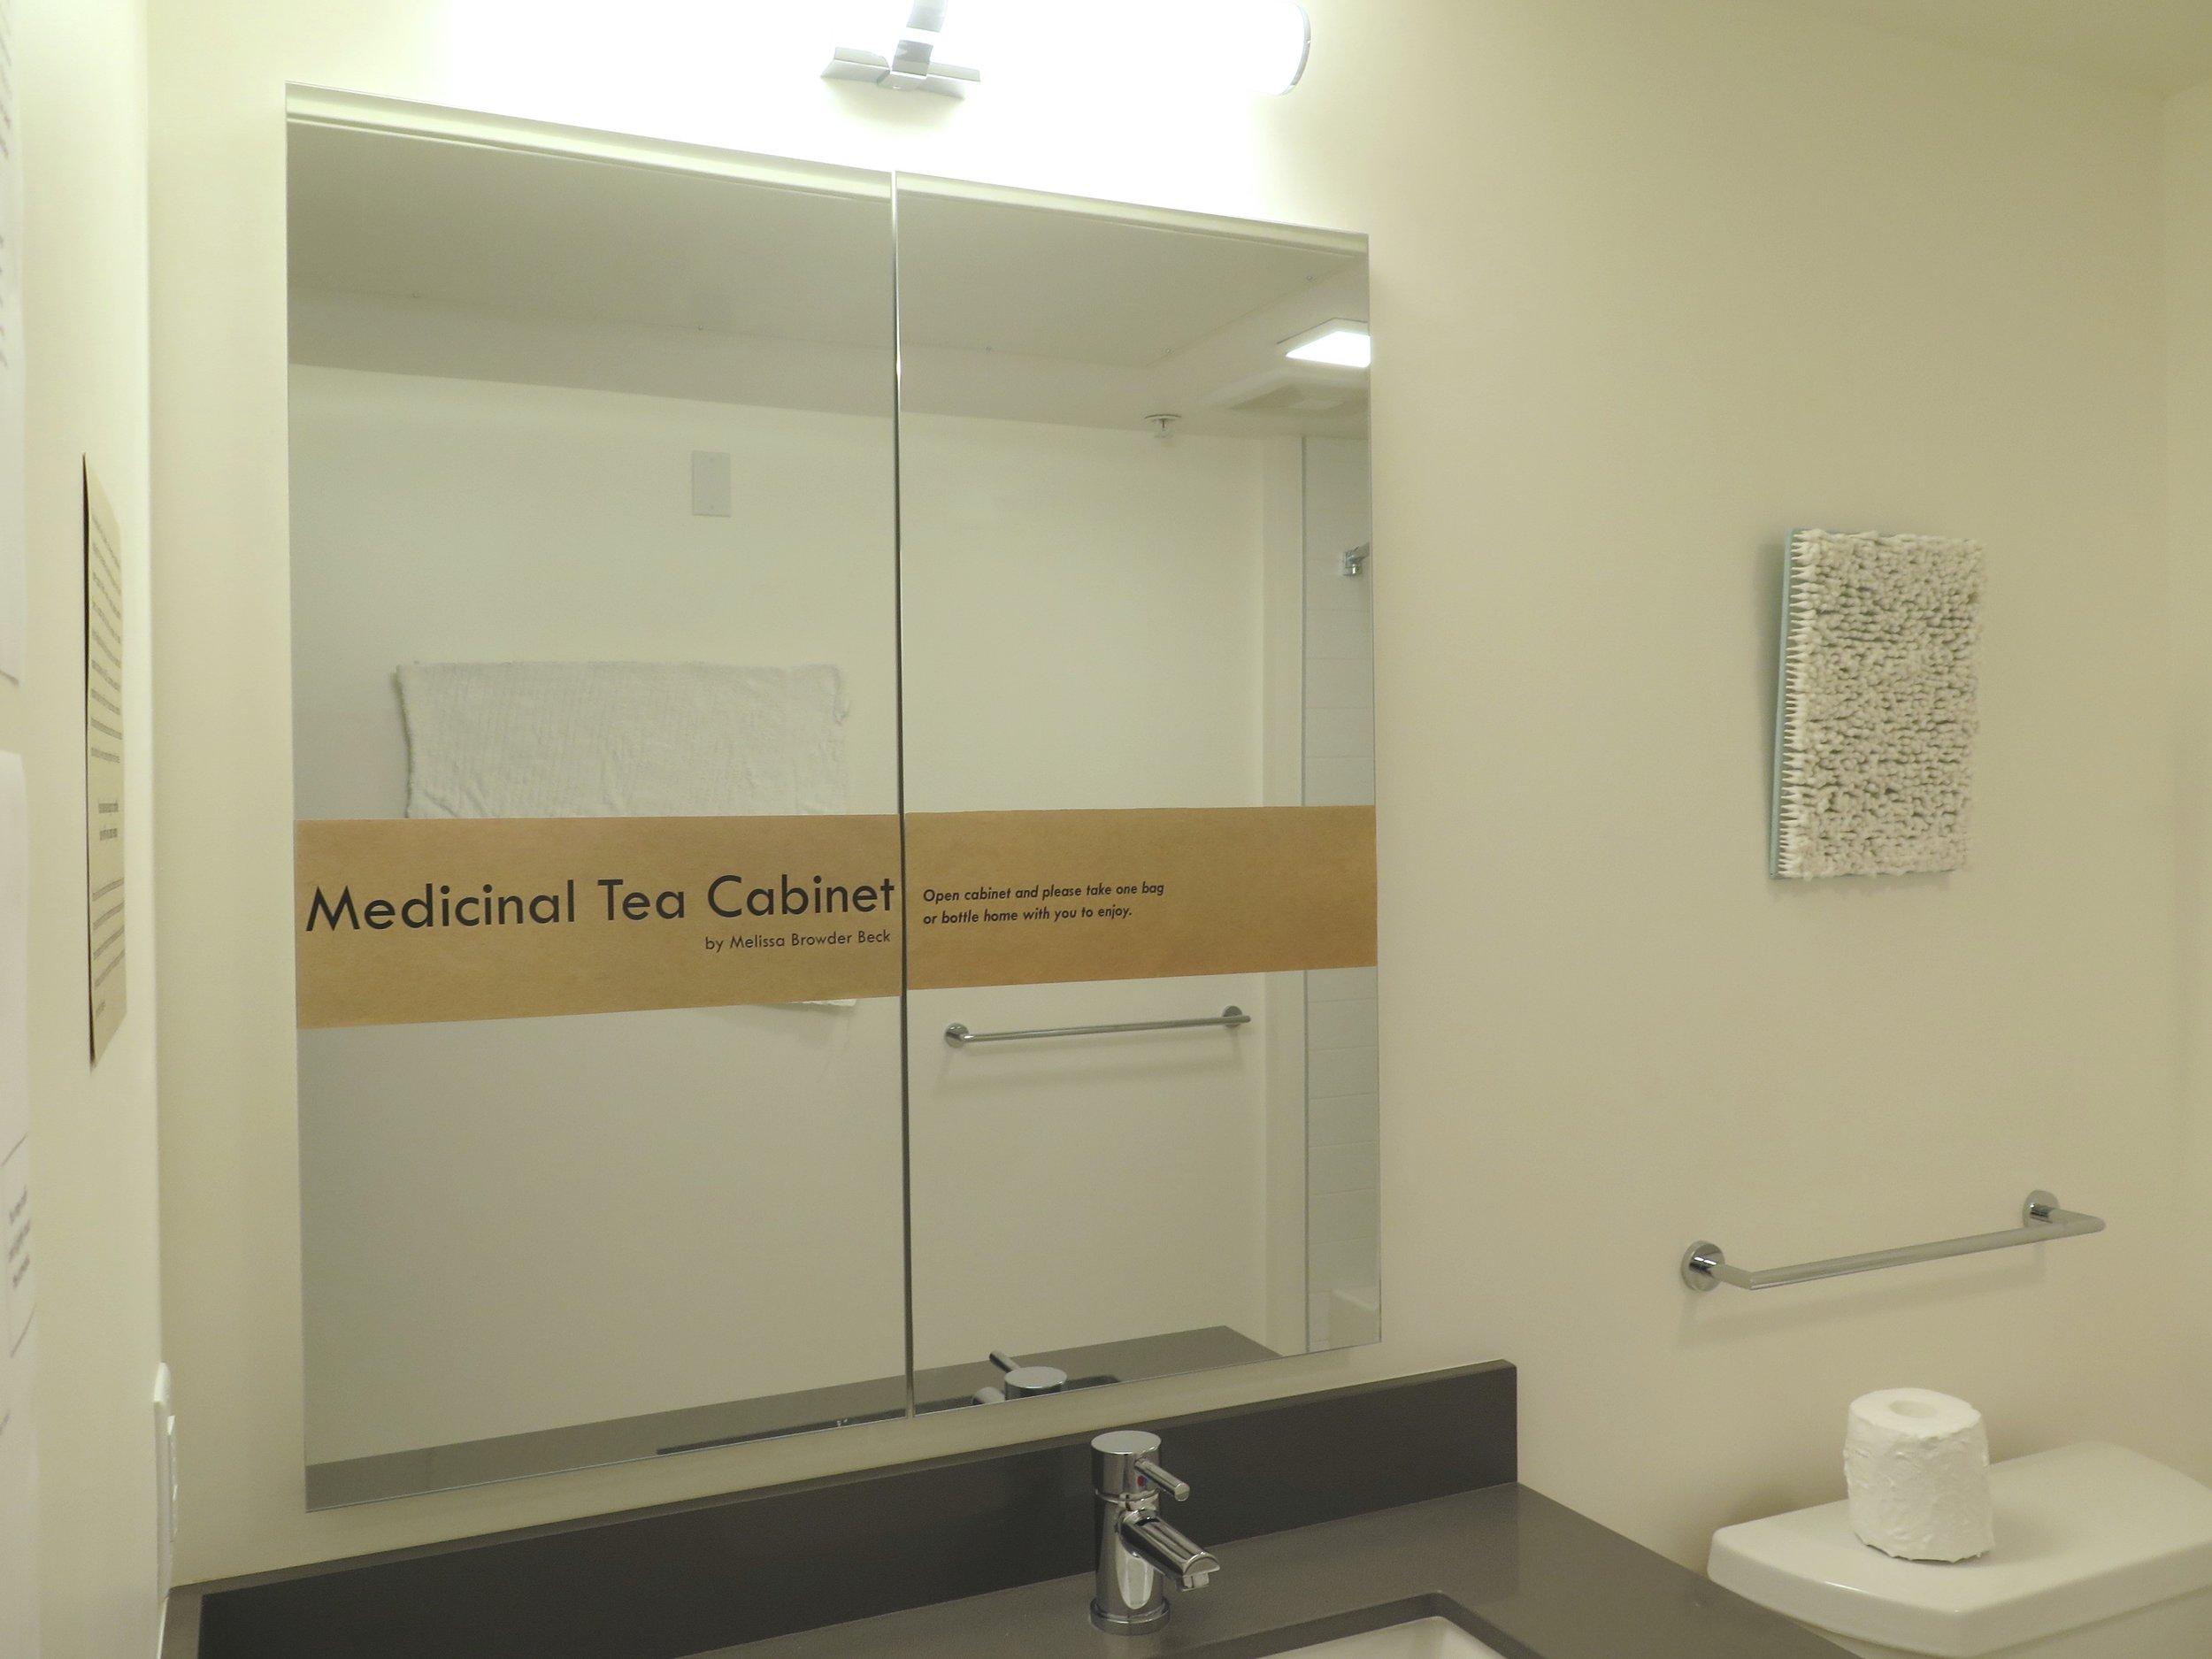 Medicinal Tea Cabinet